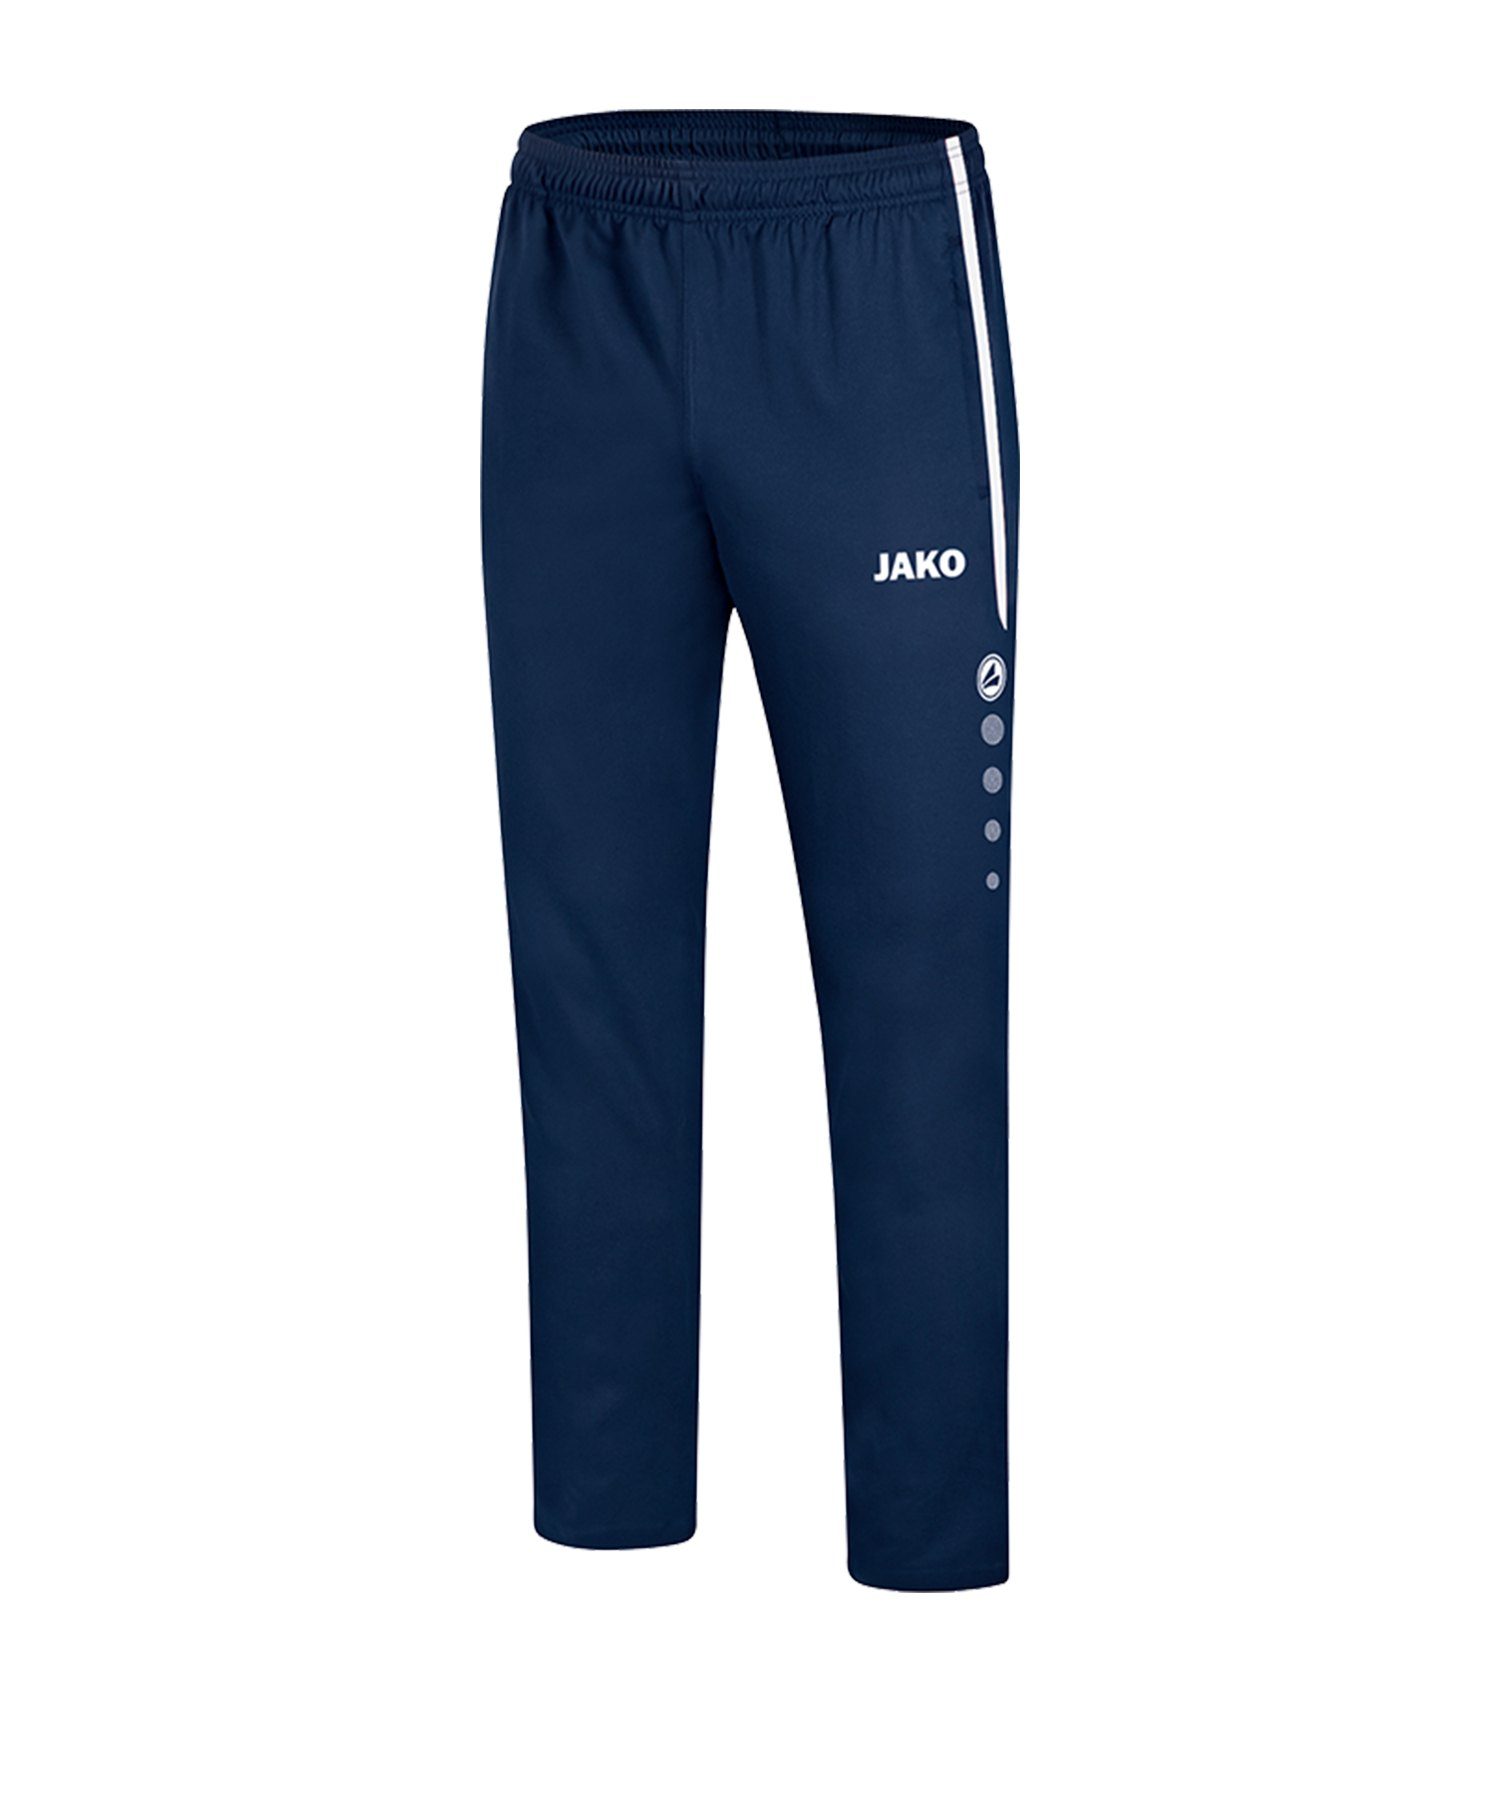 Jako Striker 2.0 Präsentationshose Damen Blau F99 - Blau